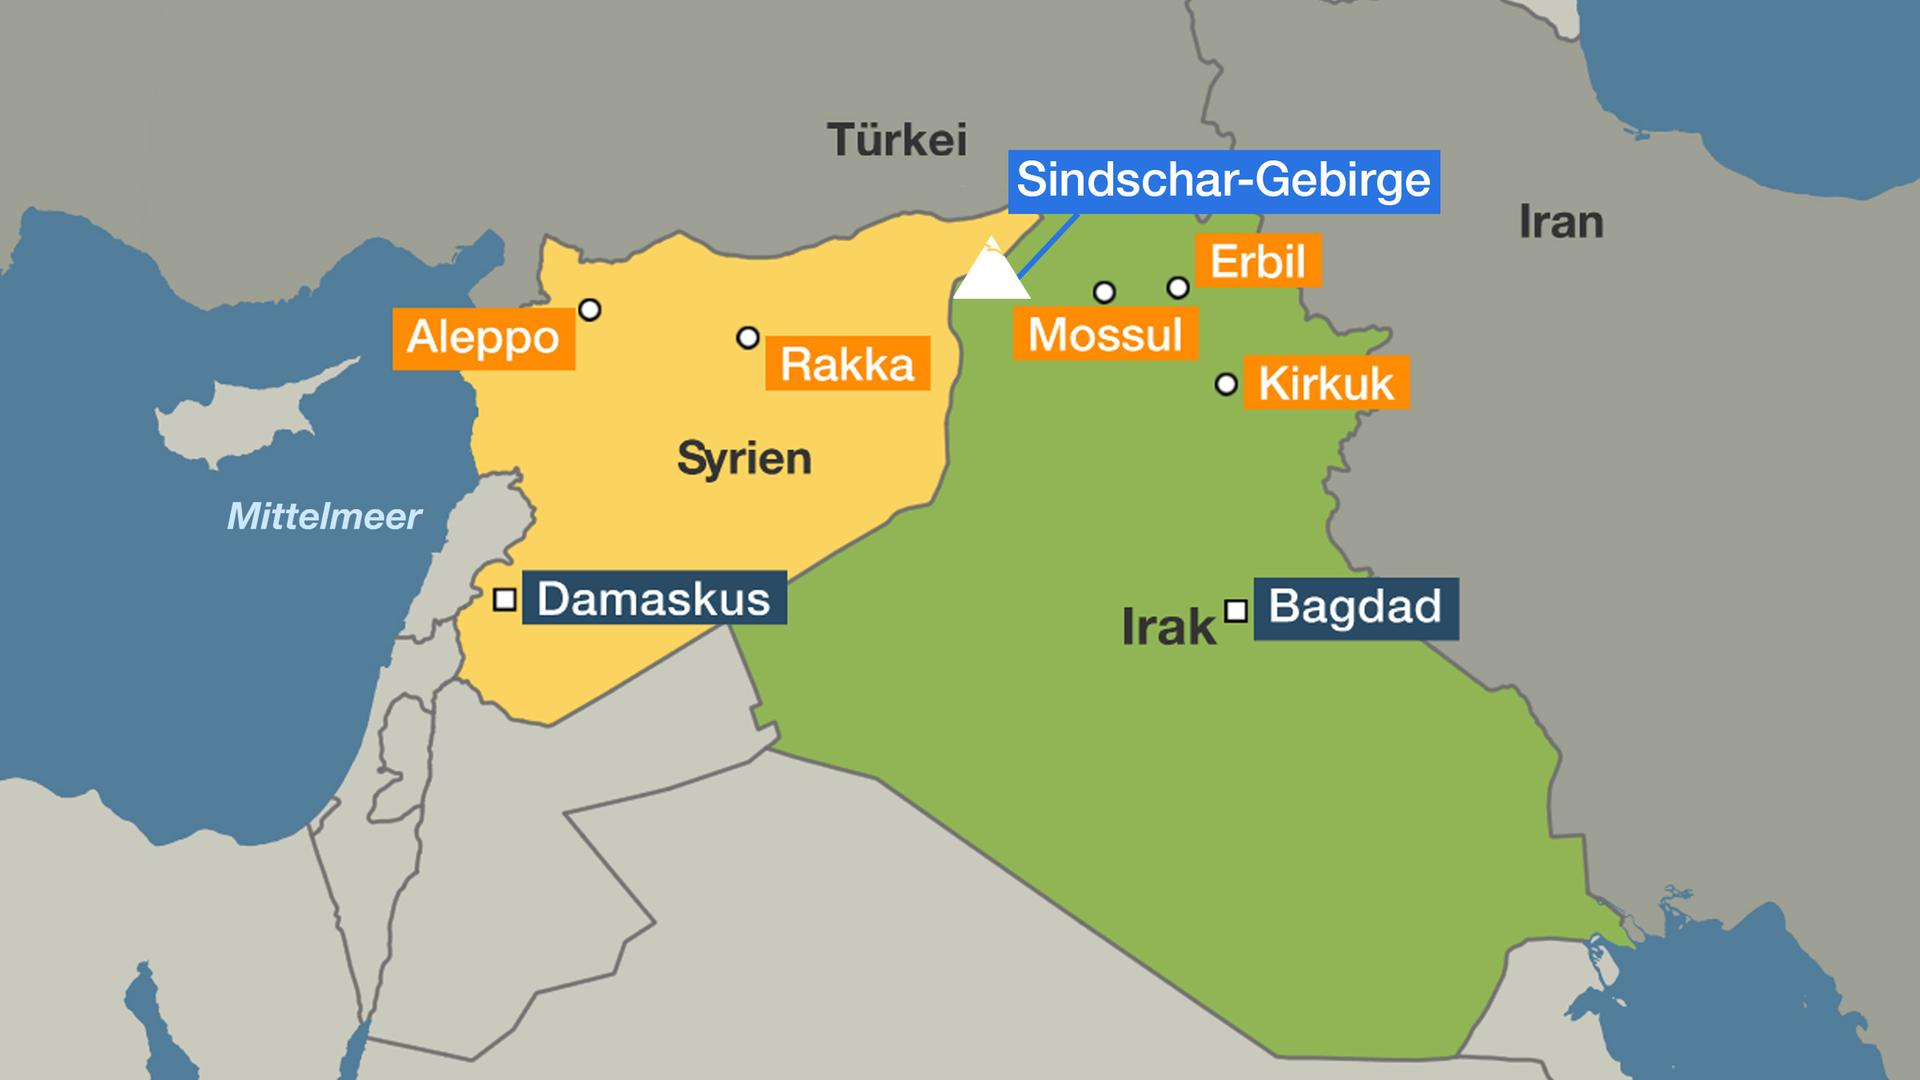 Syrien Irak Karte.Trumps Twitter Drohung Is Kämpfer Berlin In Der Zwickmühle